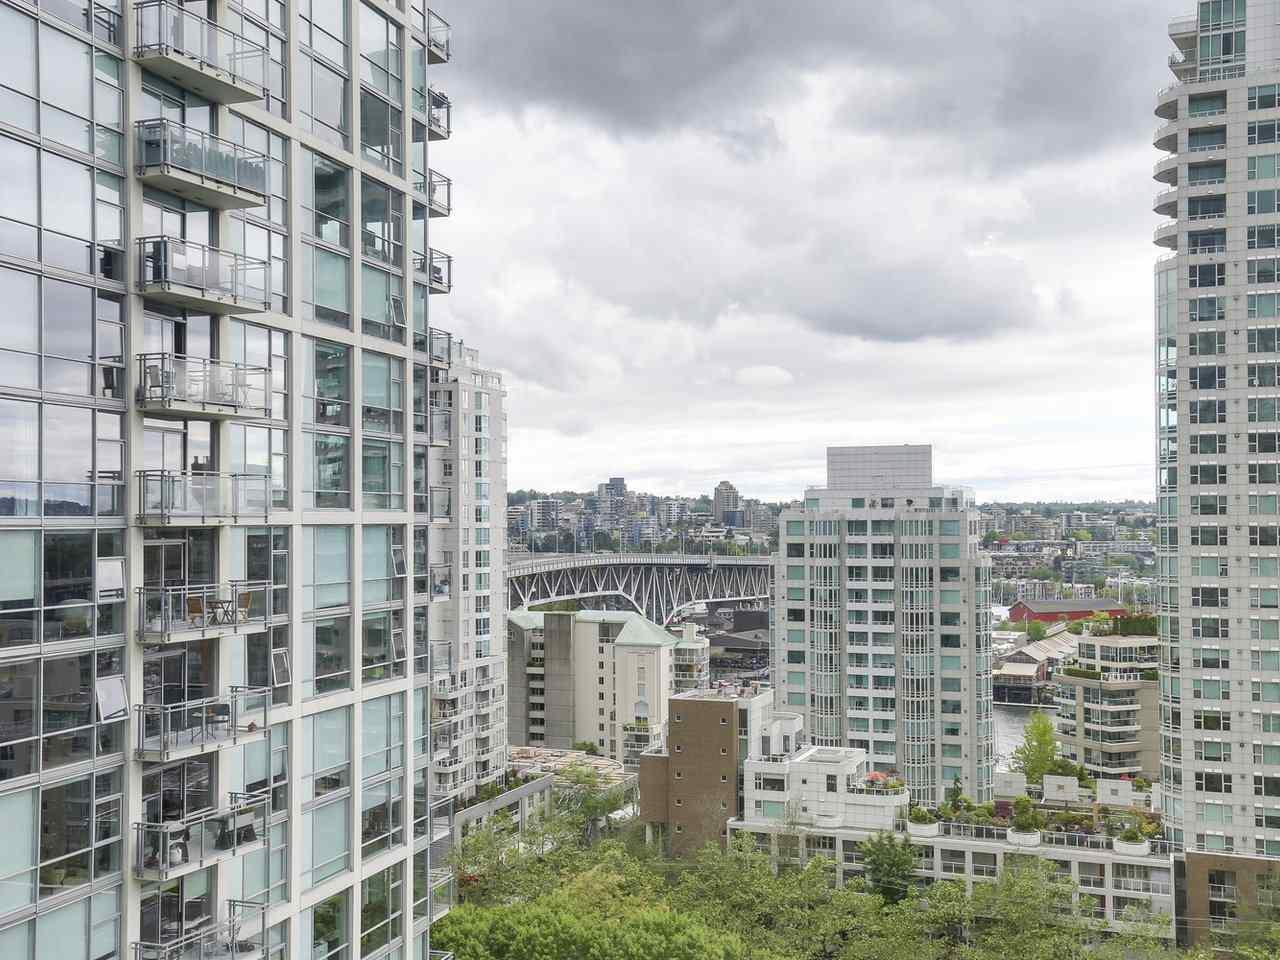 Condo Apartment at 1202 888 PACIFIC STREET, Unit 1202, Vancouver West, British Columbia. Image 11